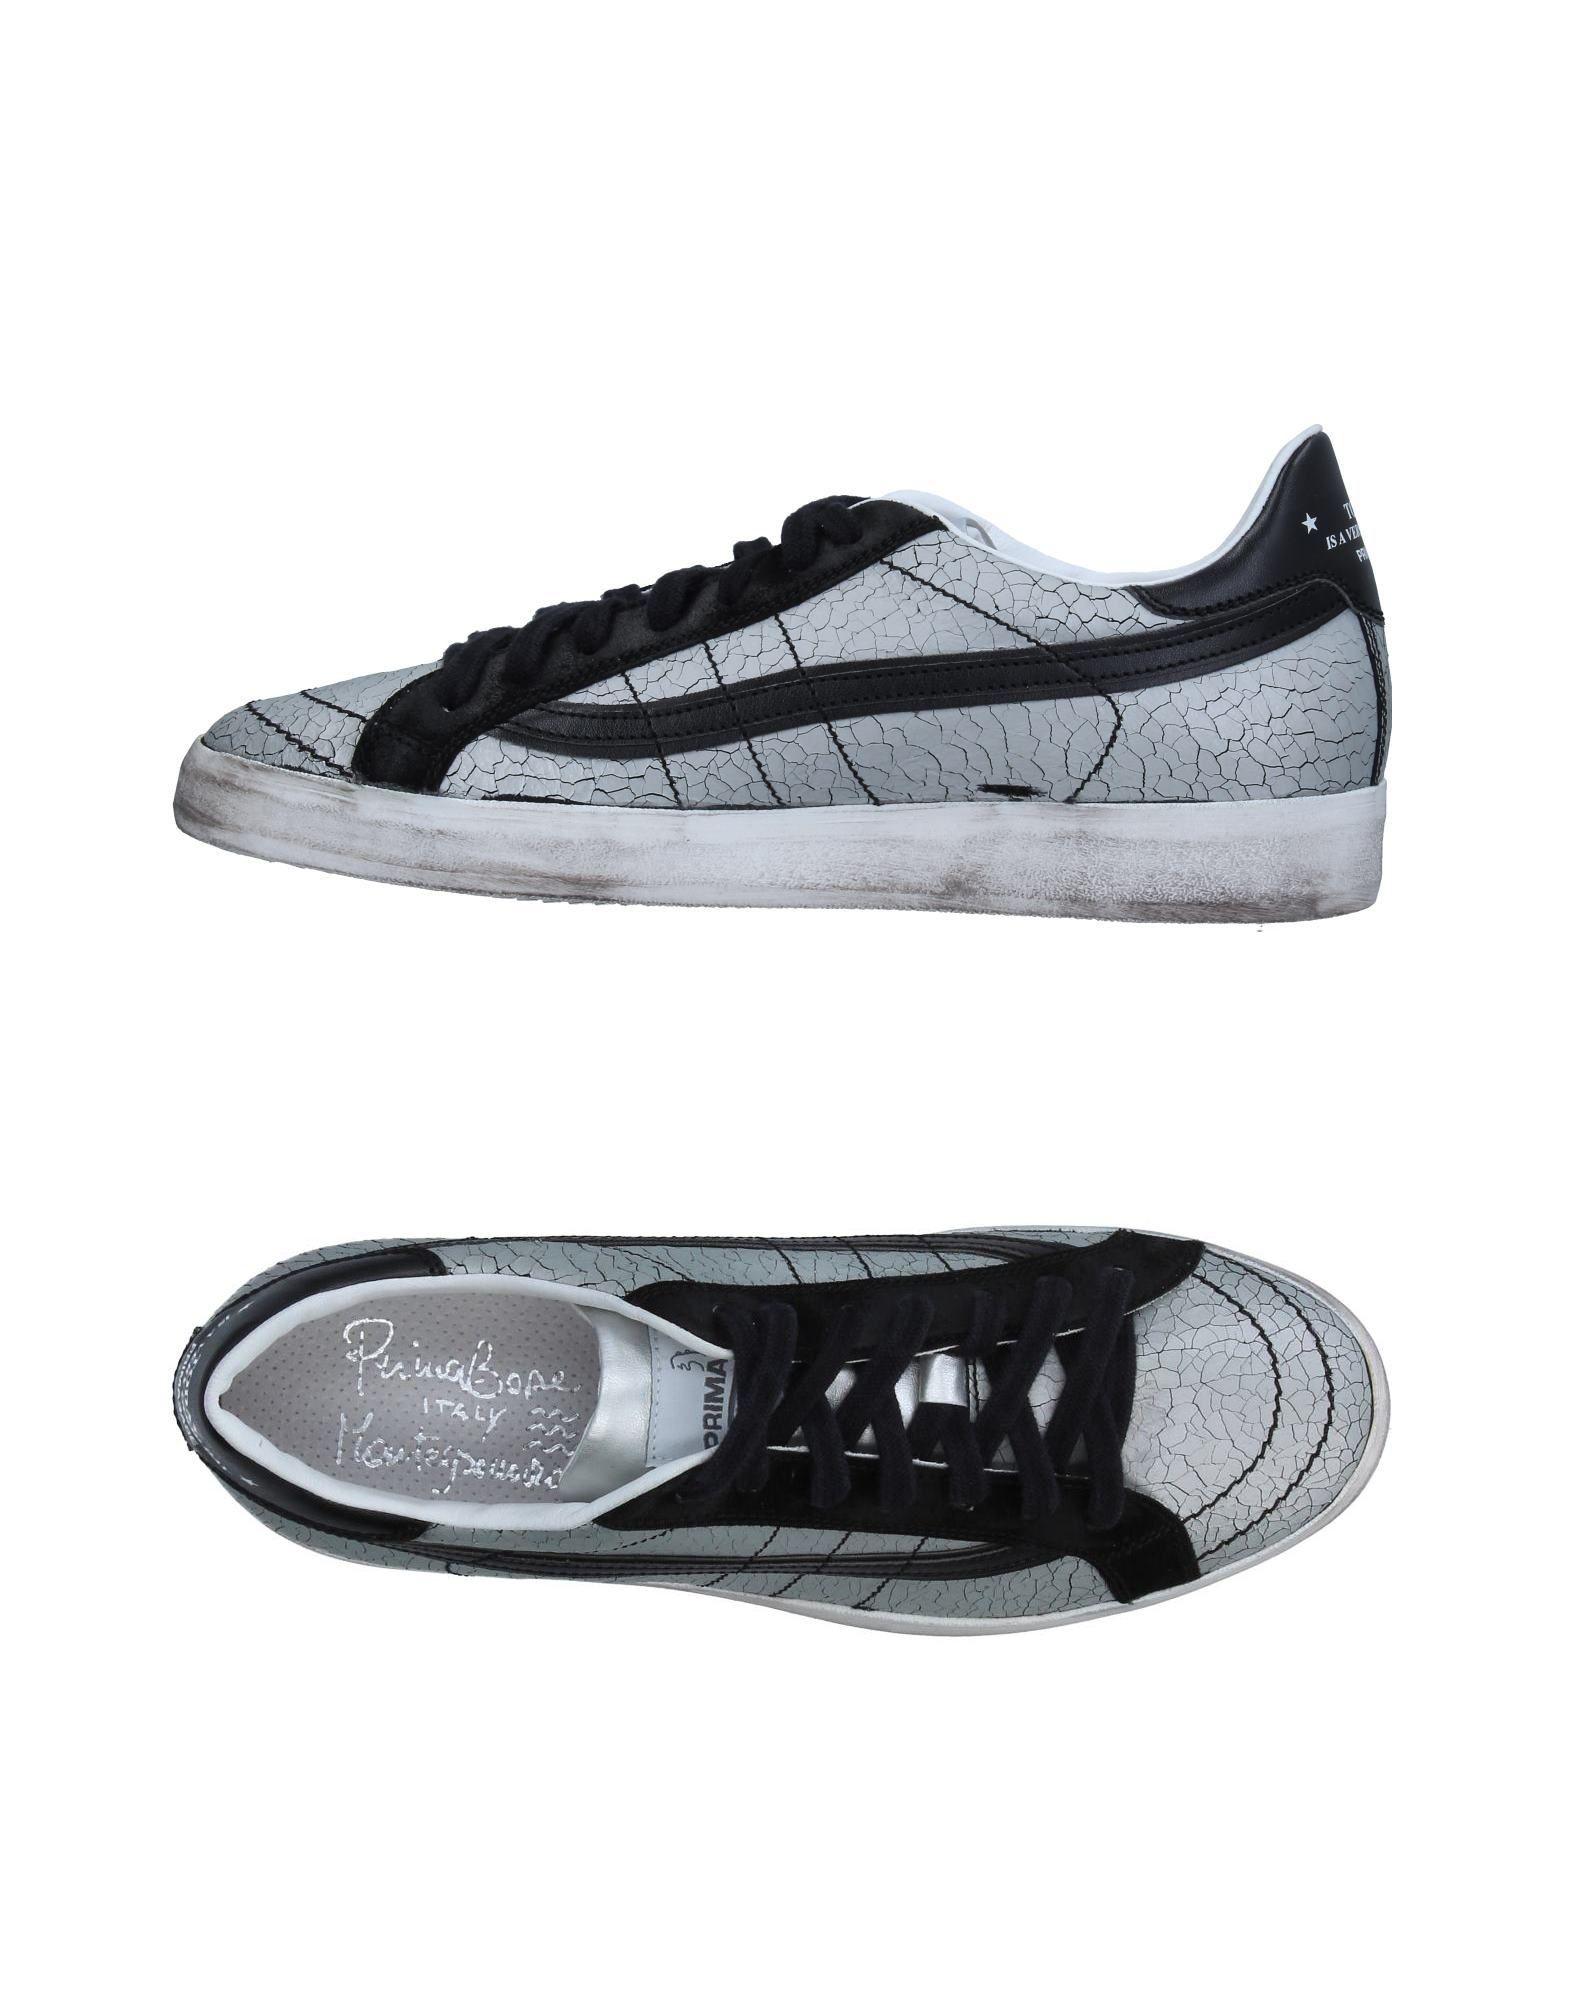 PRIMABASE Herren Low Sneakers & Tennisschuhe Farbe Grau Größe 9 jetztbilligerkaufen